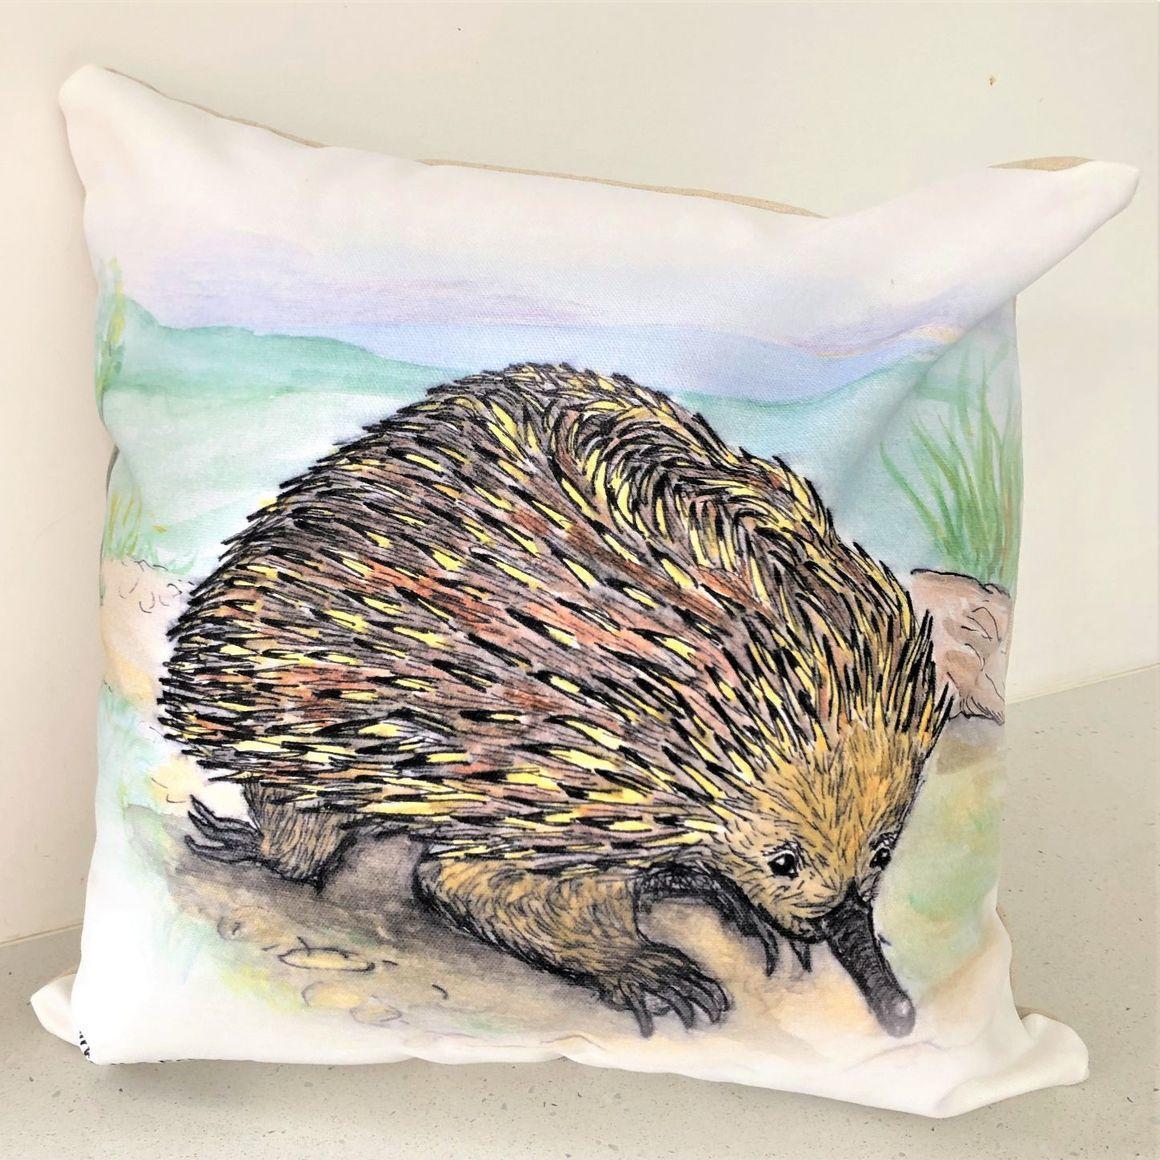 Cushion Cover - Kirra the Echidna   Trada Marketplace